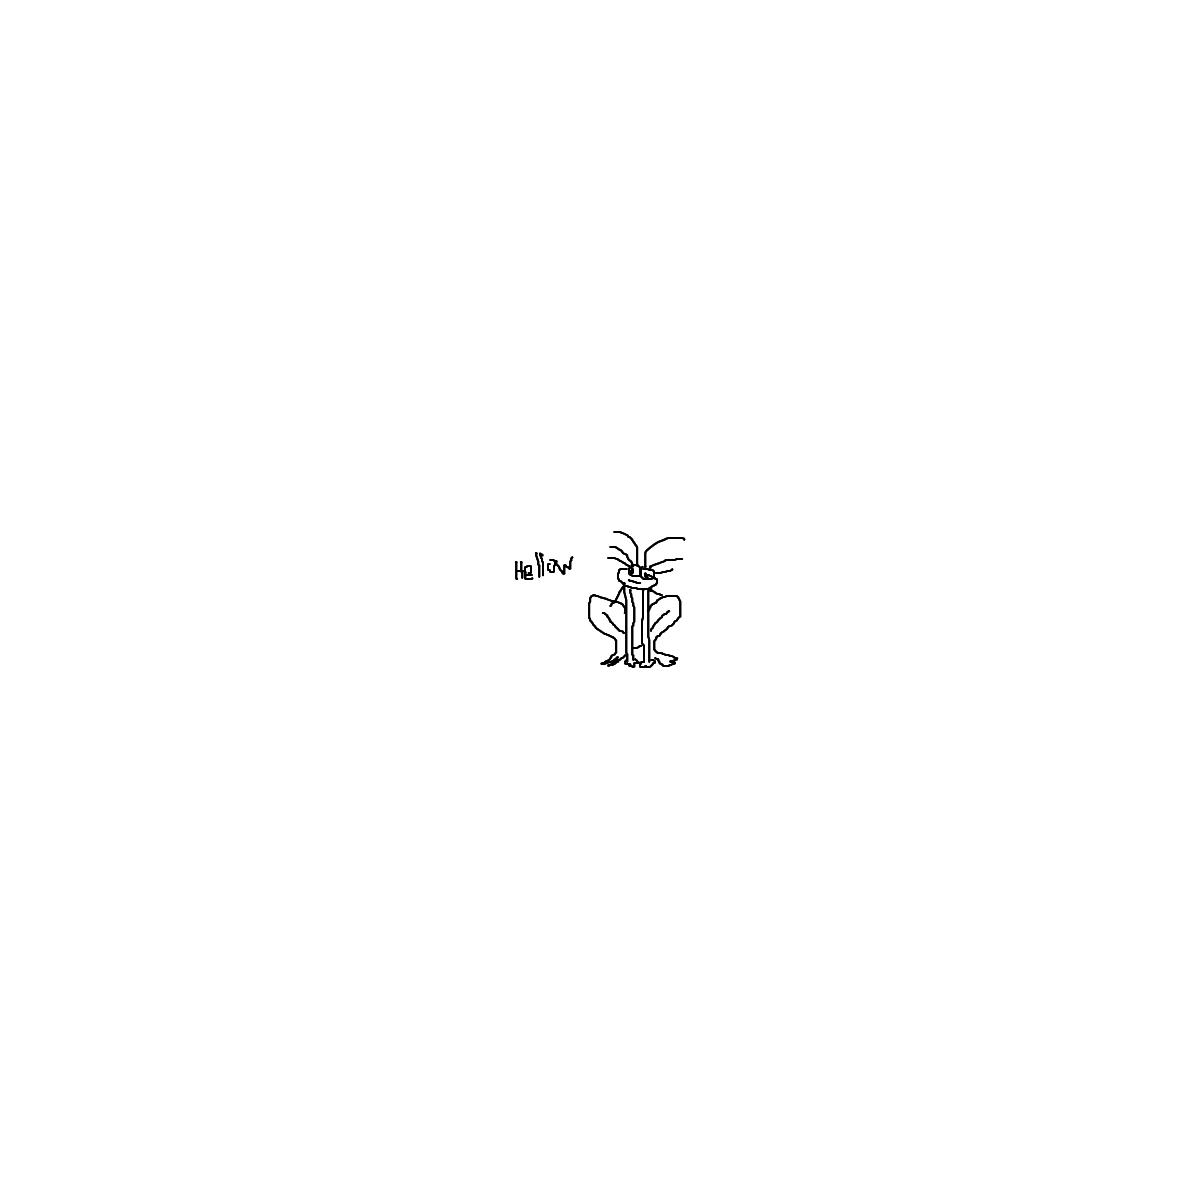 BAAAM drawing#5809 lat:41.2986106872558600lng: 26.1543407440185550